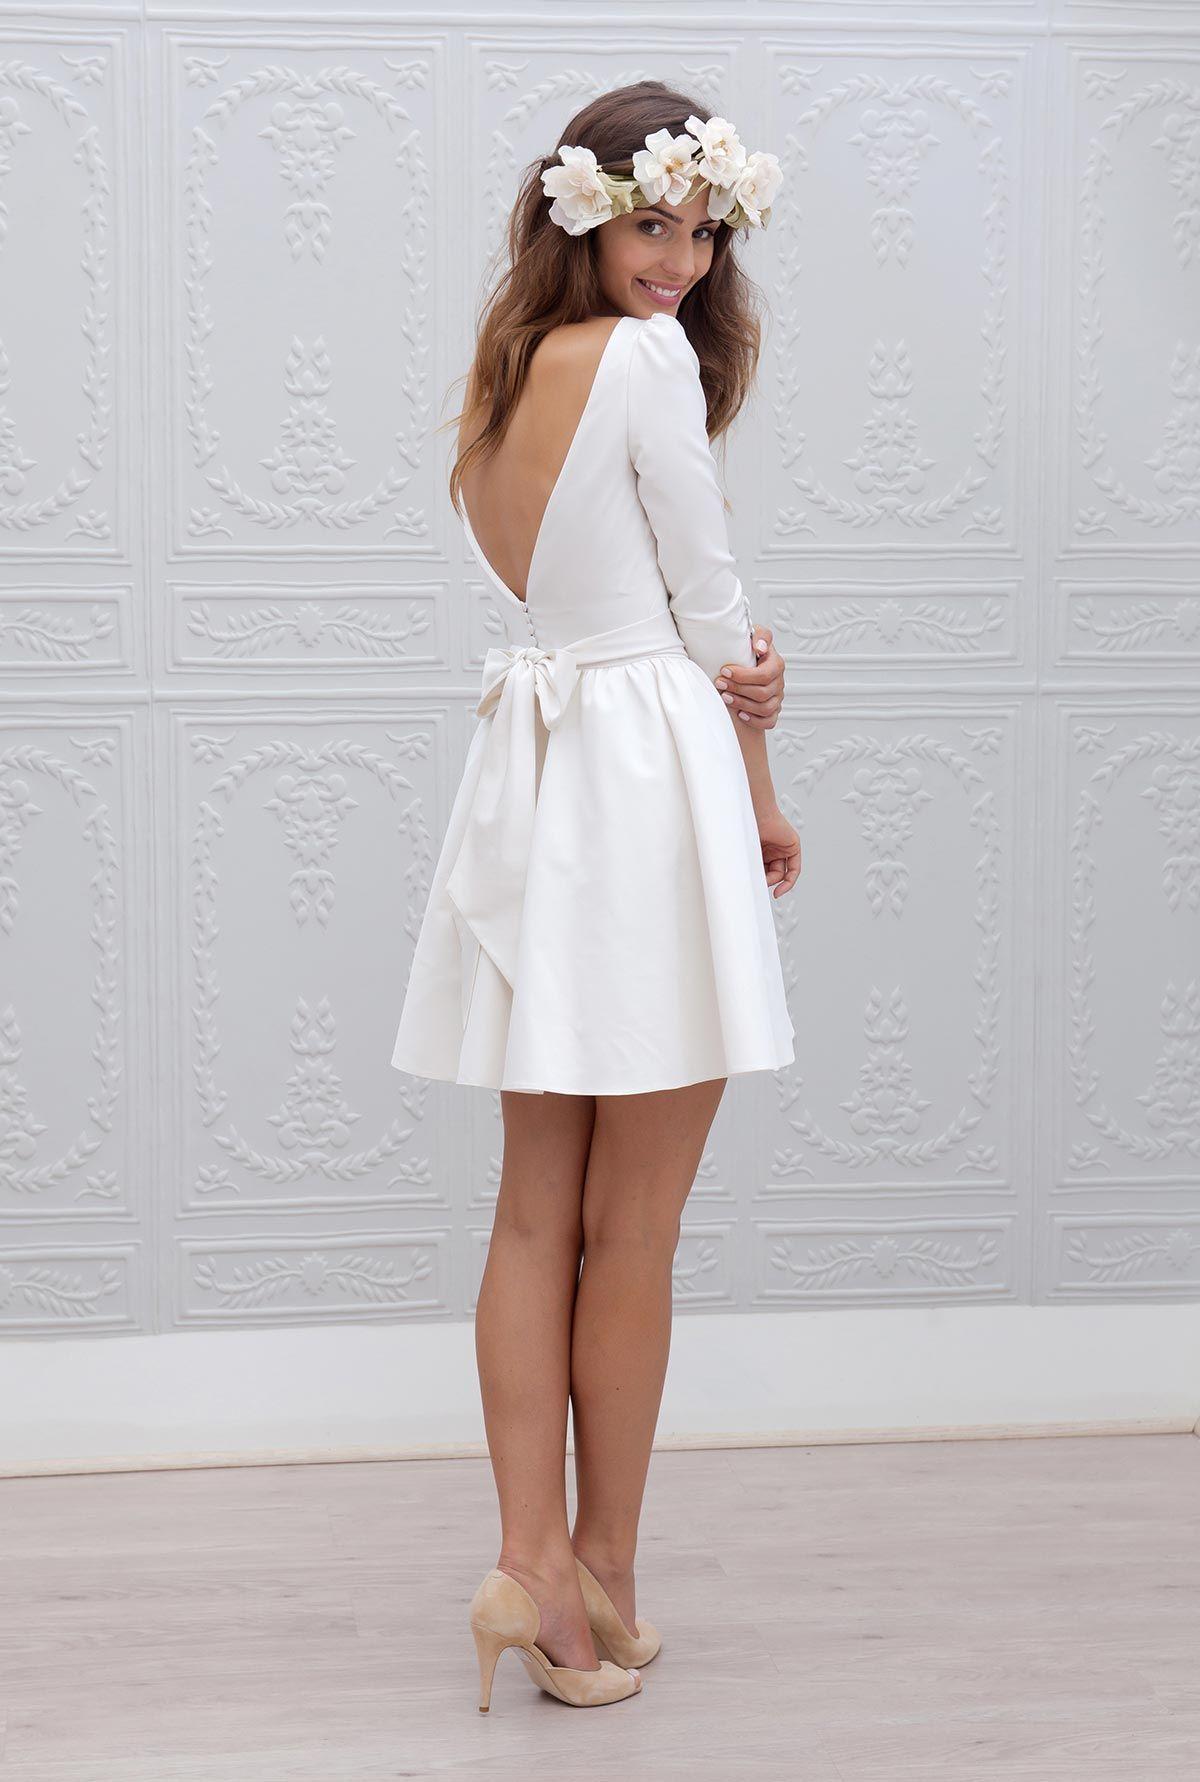 Robe de cocktail chic 2015